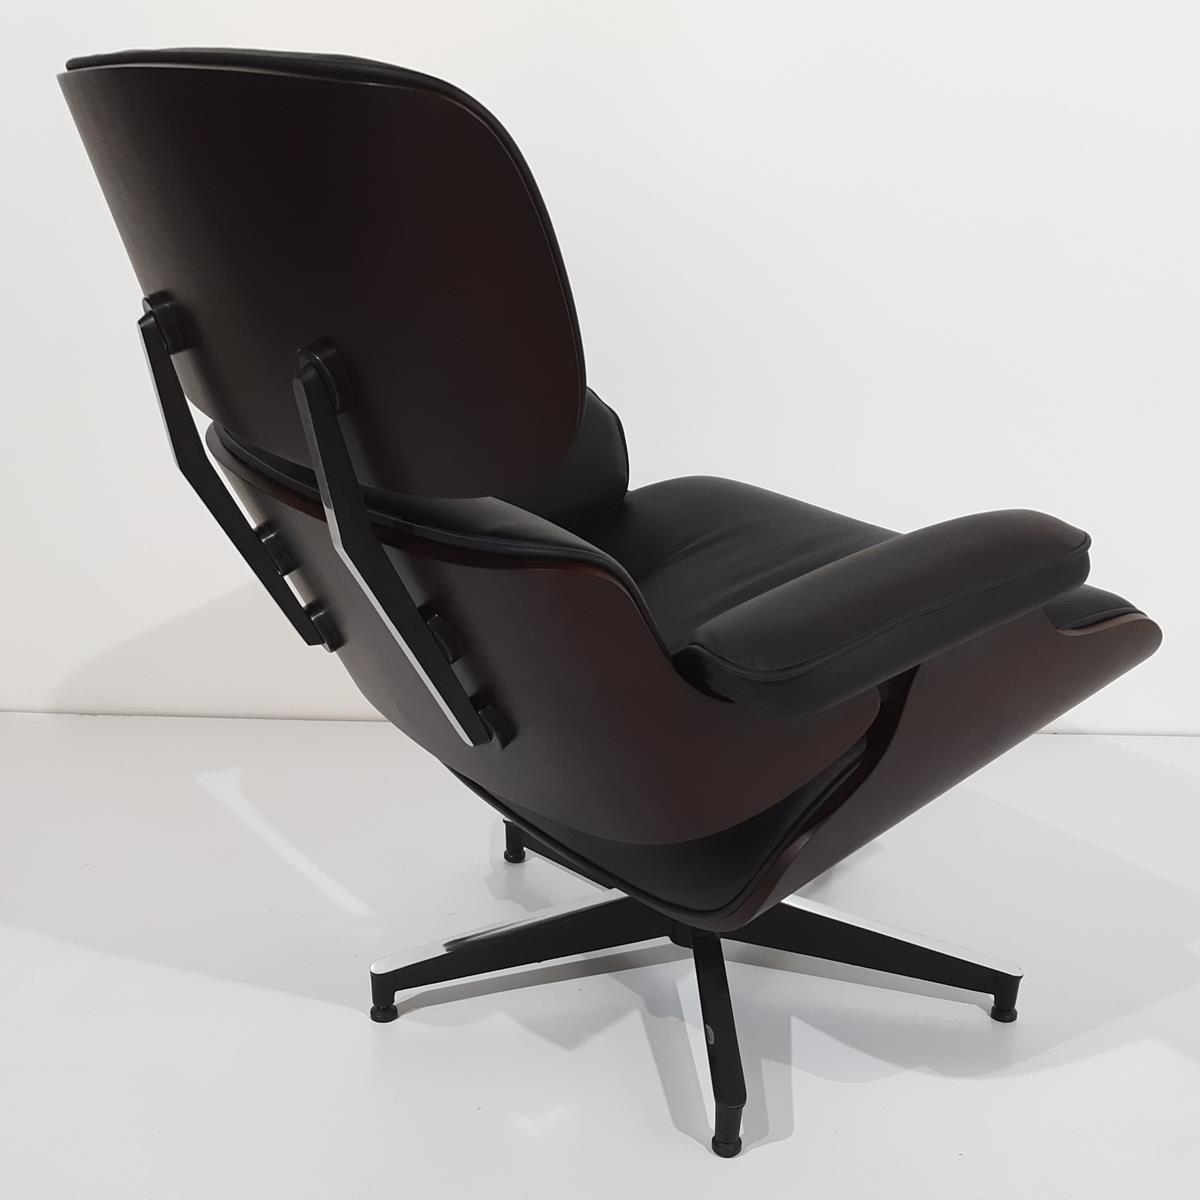 Poltrona 093 Charles Eames (B)